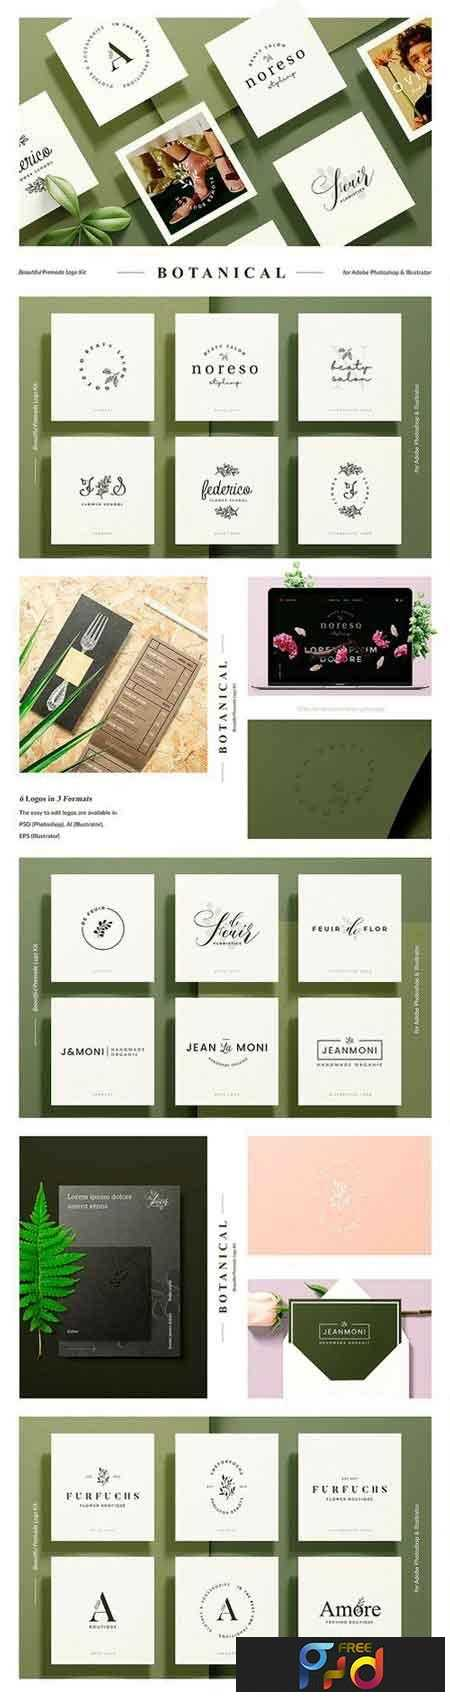 1807091 Botanical Logo Kit 2534755 1